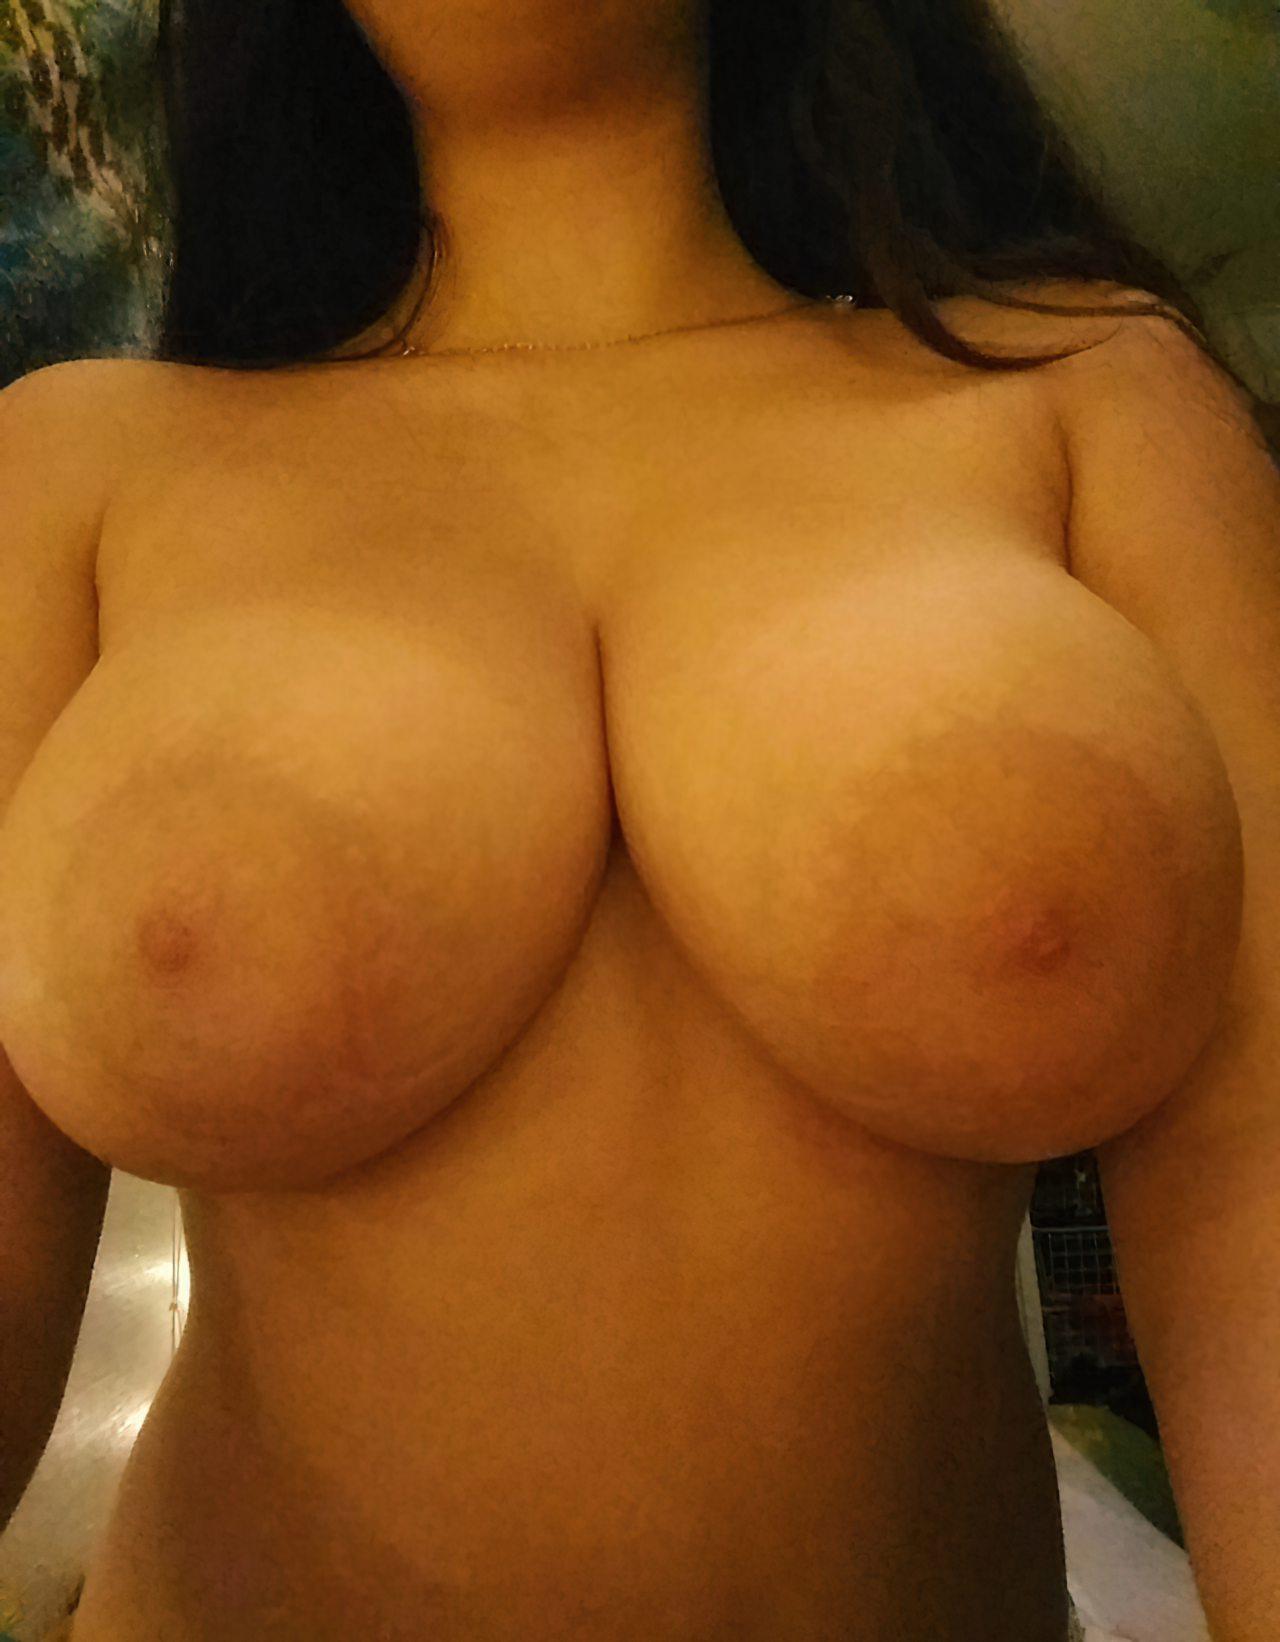 Mulheres Nuas Fotos (34)